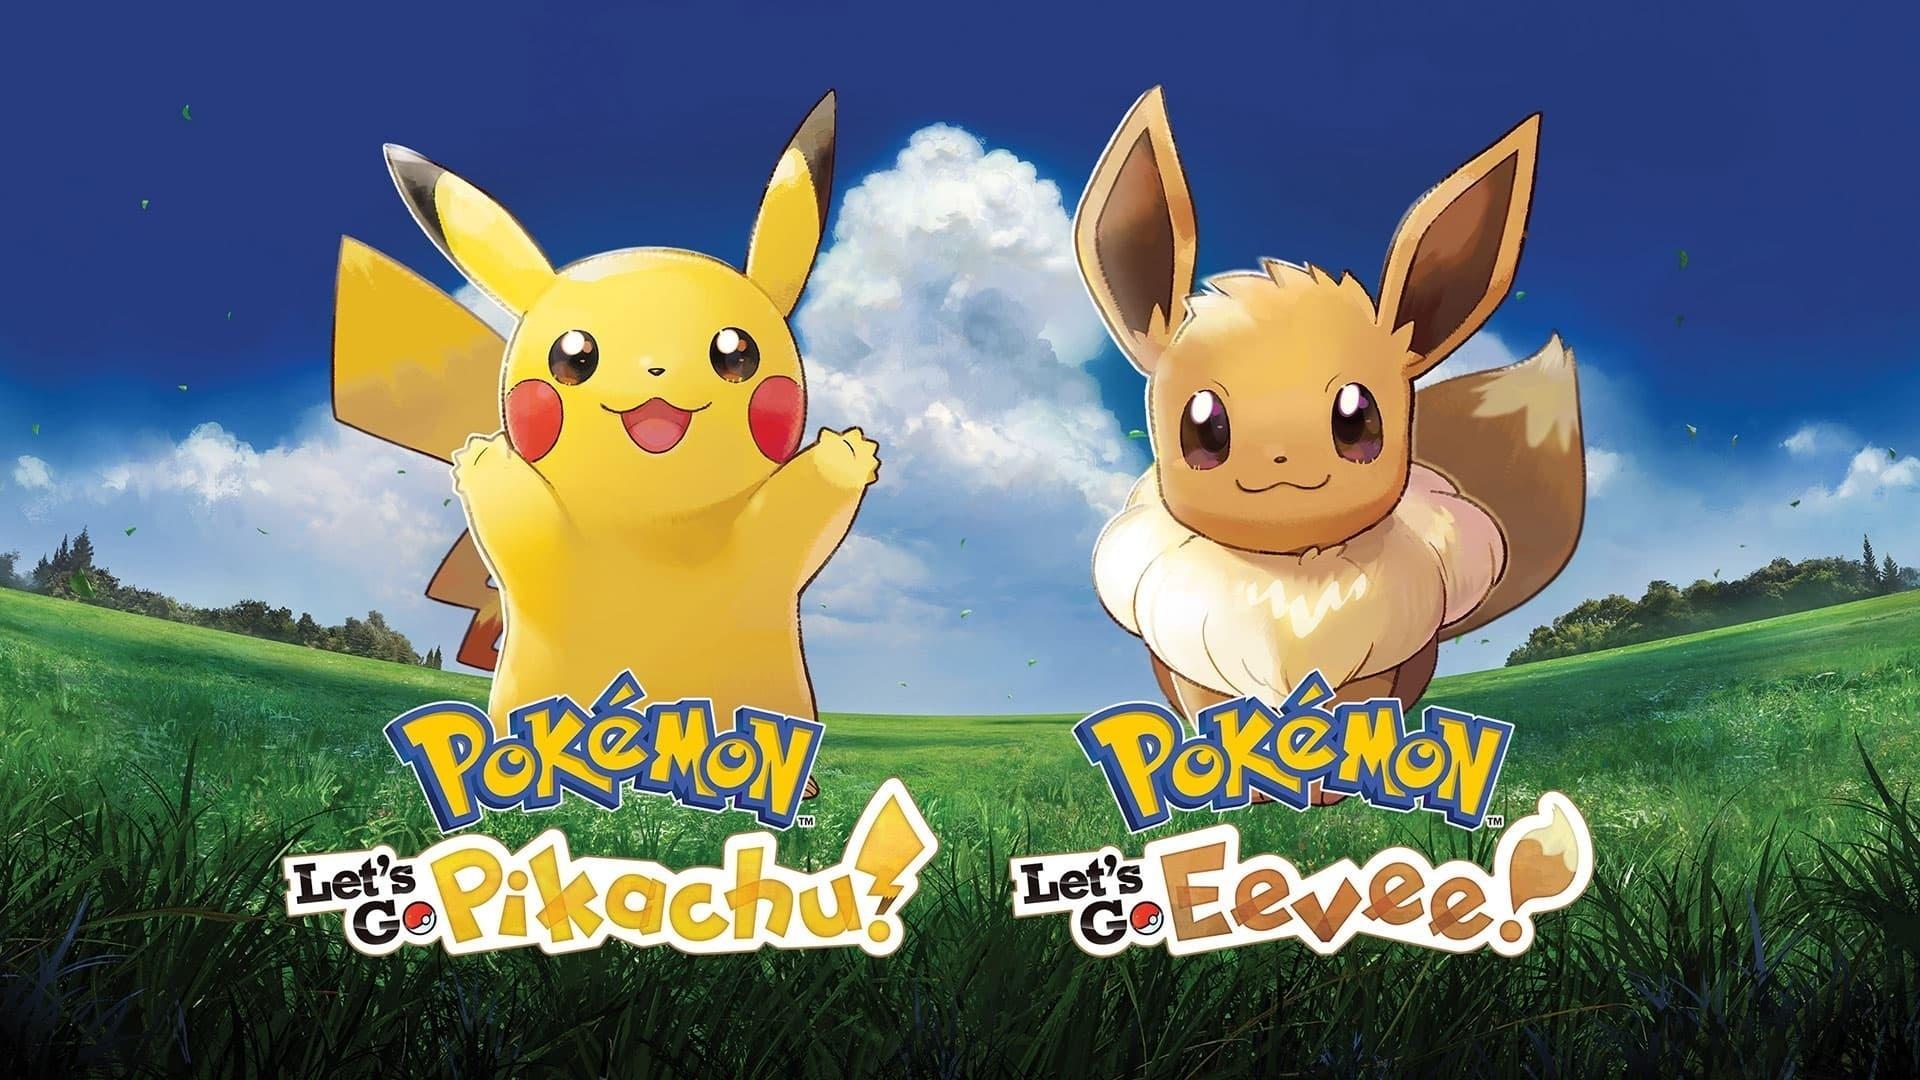 Demo de Pokémon Let's Go, Pikachu! / Let's Go, Eevee! está disponível na eShop